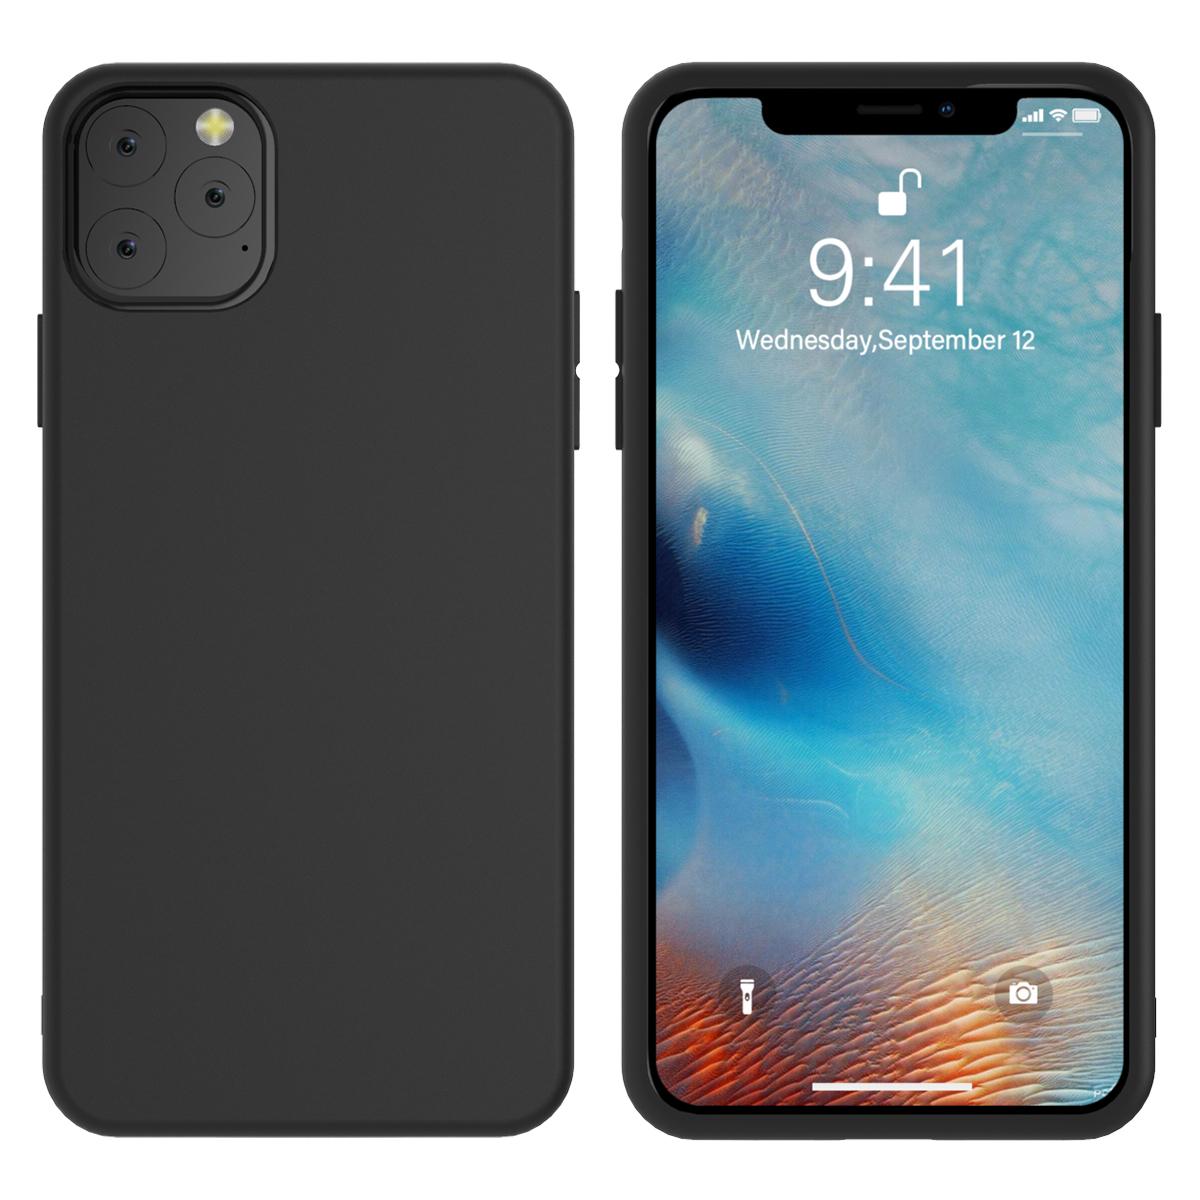 Torubia Silicone Case for iPhone 11/11 Pro/11 Pro Max 126